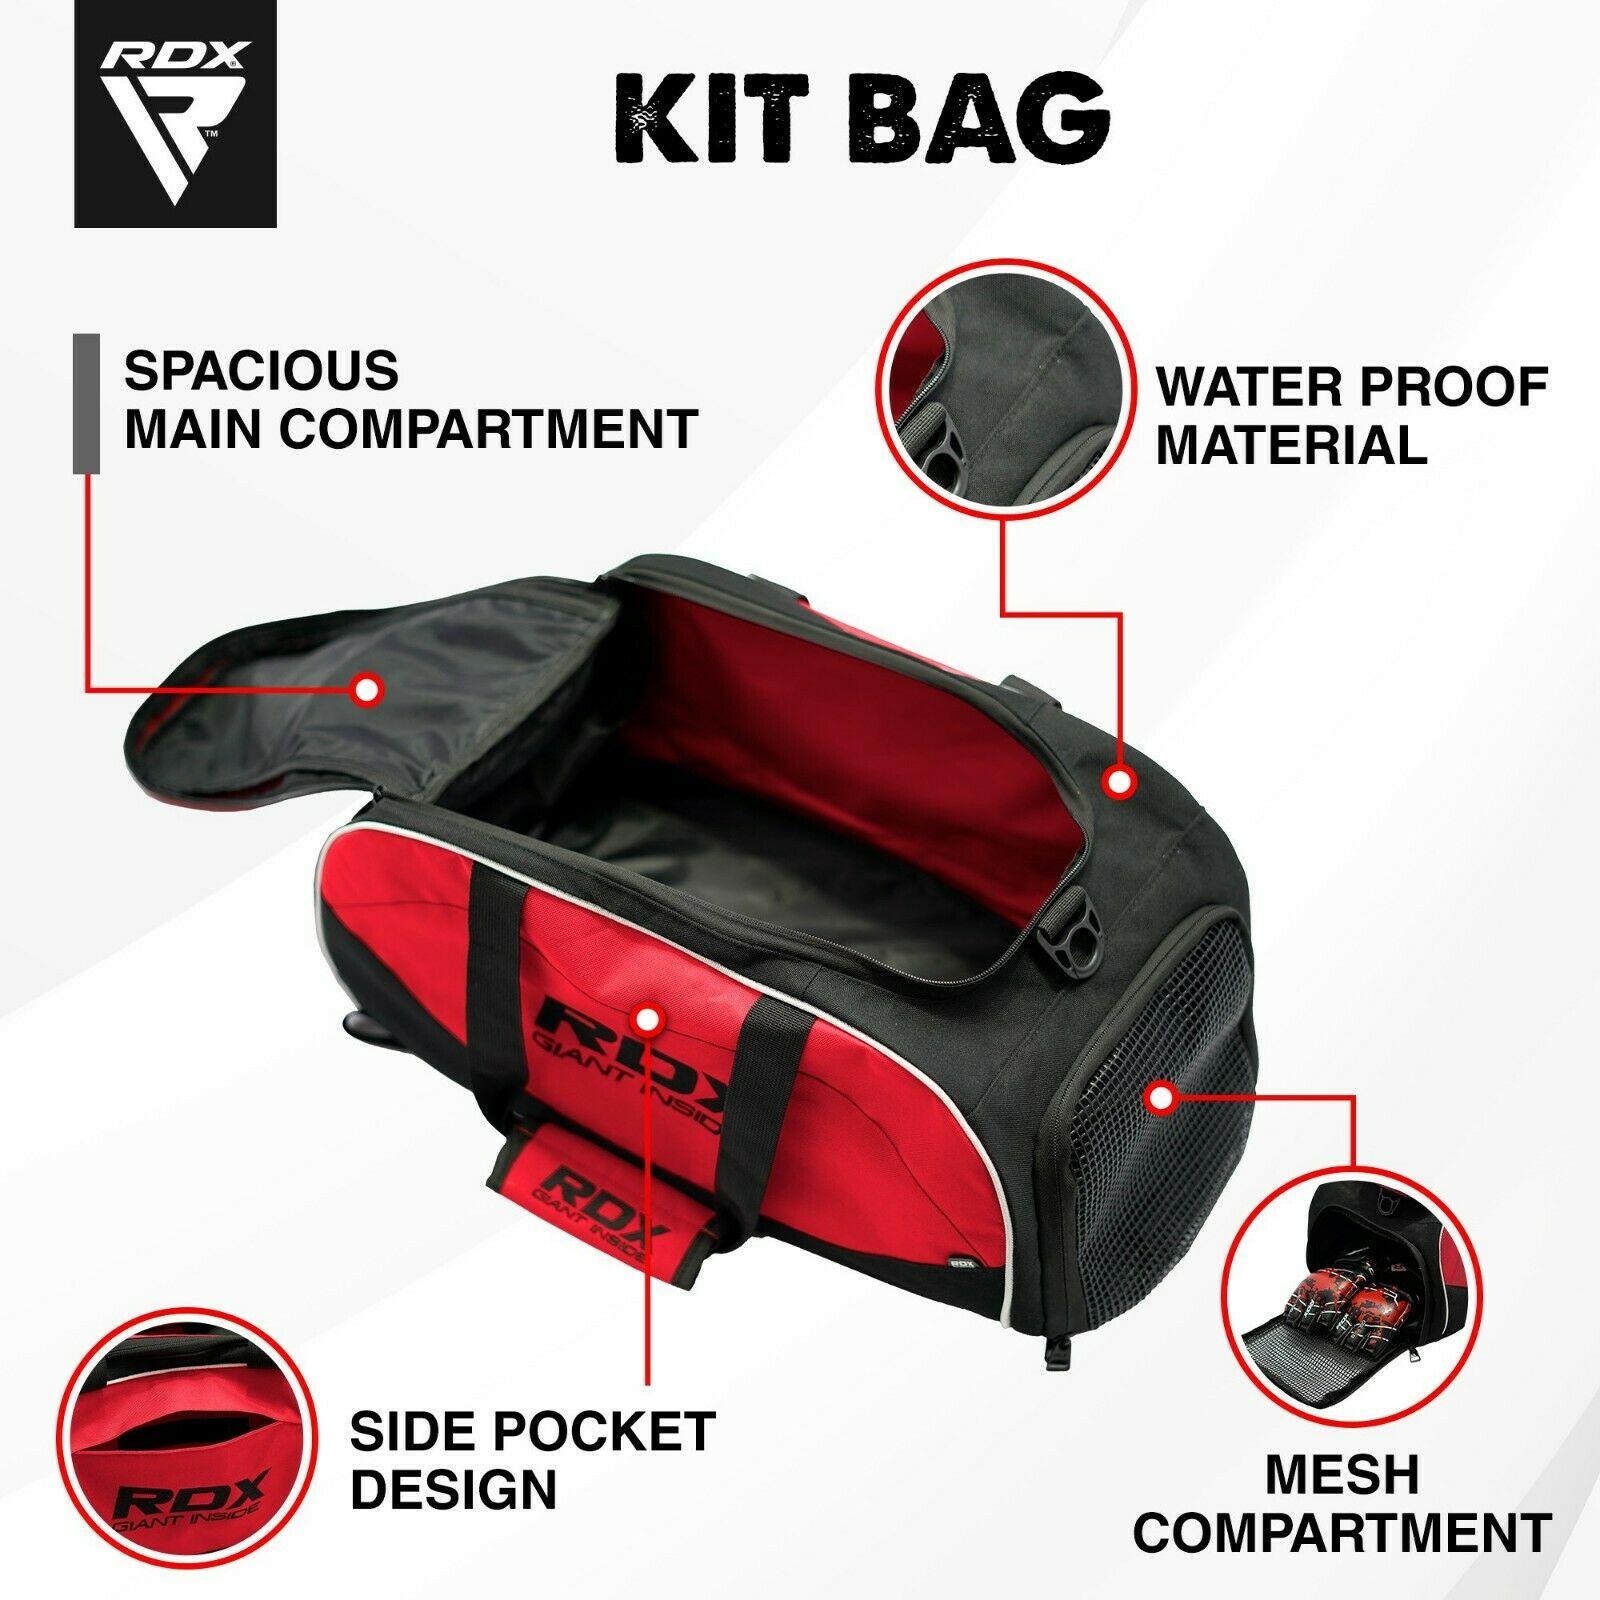 RDX Gimnasio Bolsa Saco Pesado Mochila Rojo Gimnasio Fitness Gym Bolsa Kit Bag